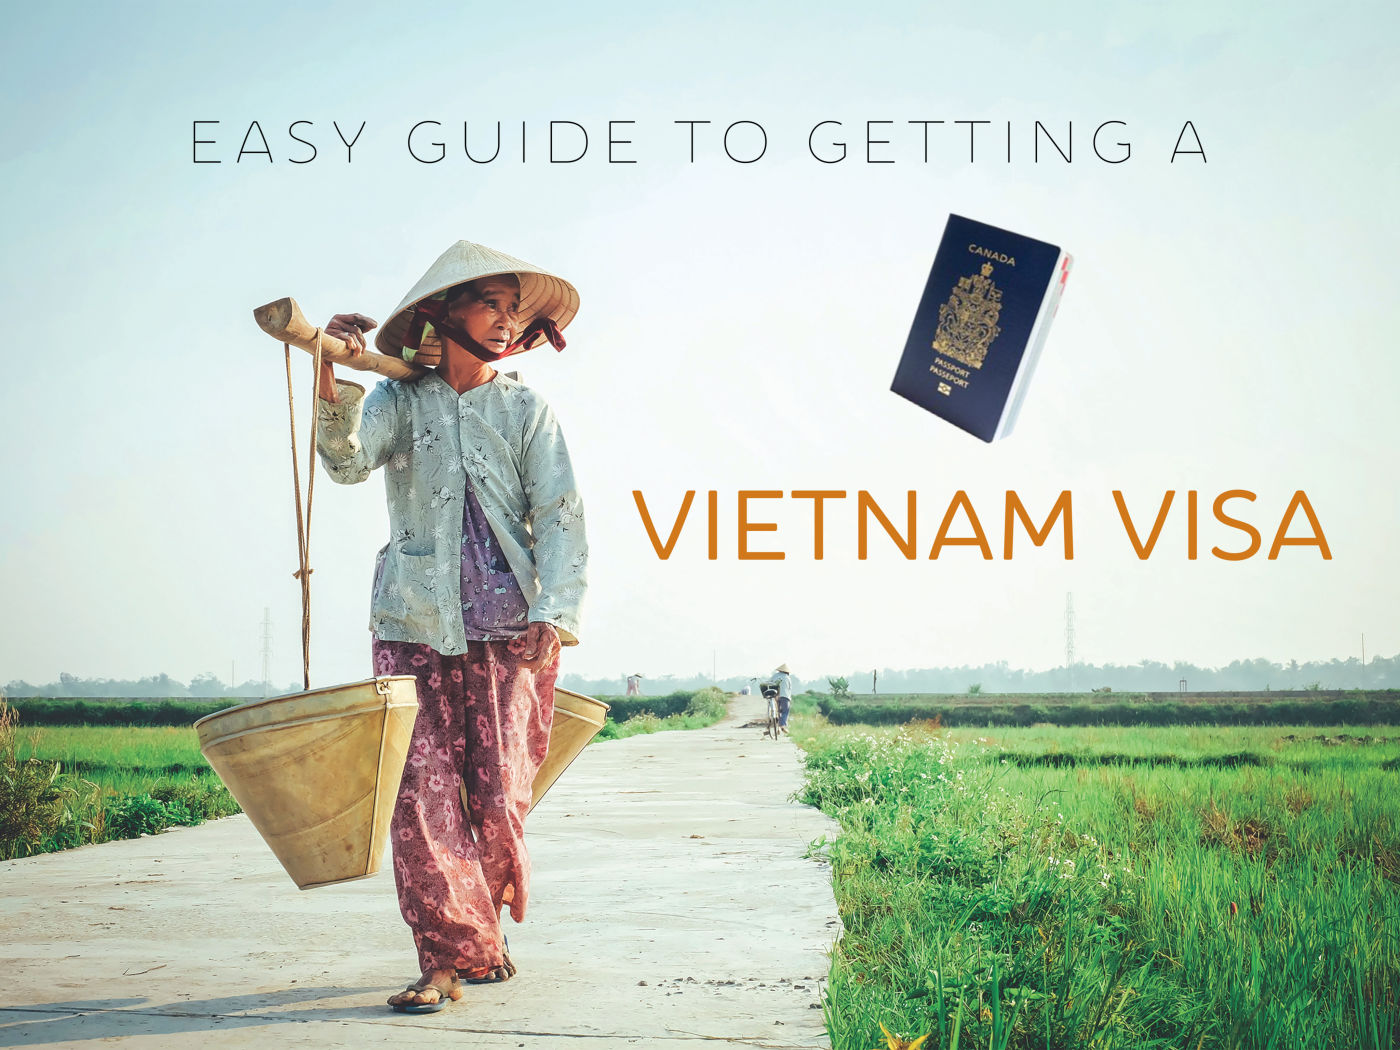 Vietnam Visa Guide - How to get a 90day vietnam visa online